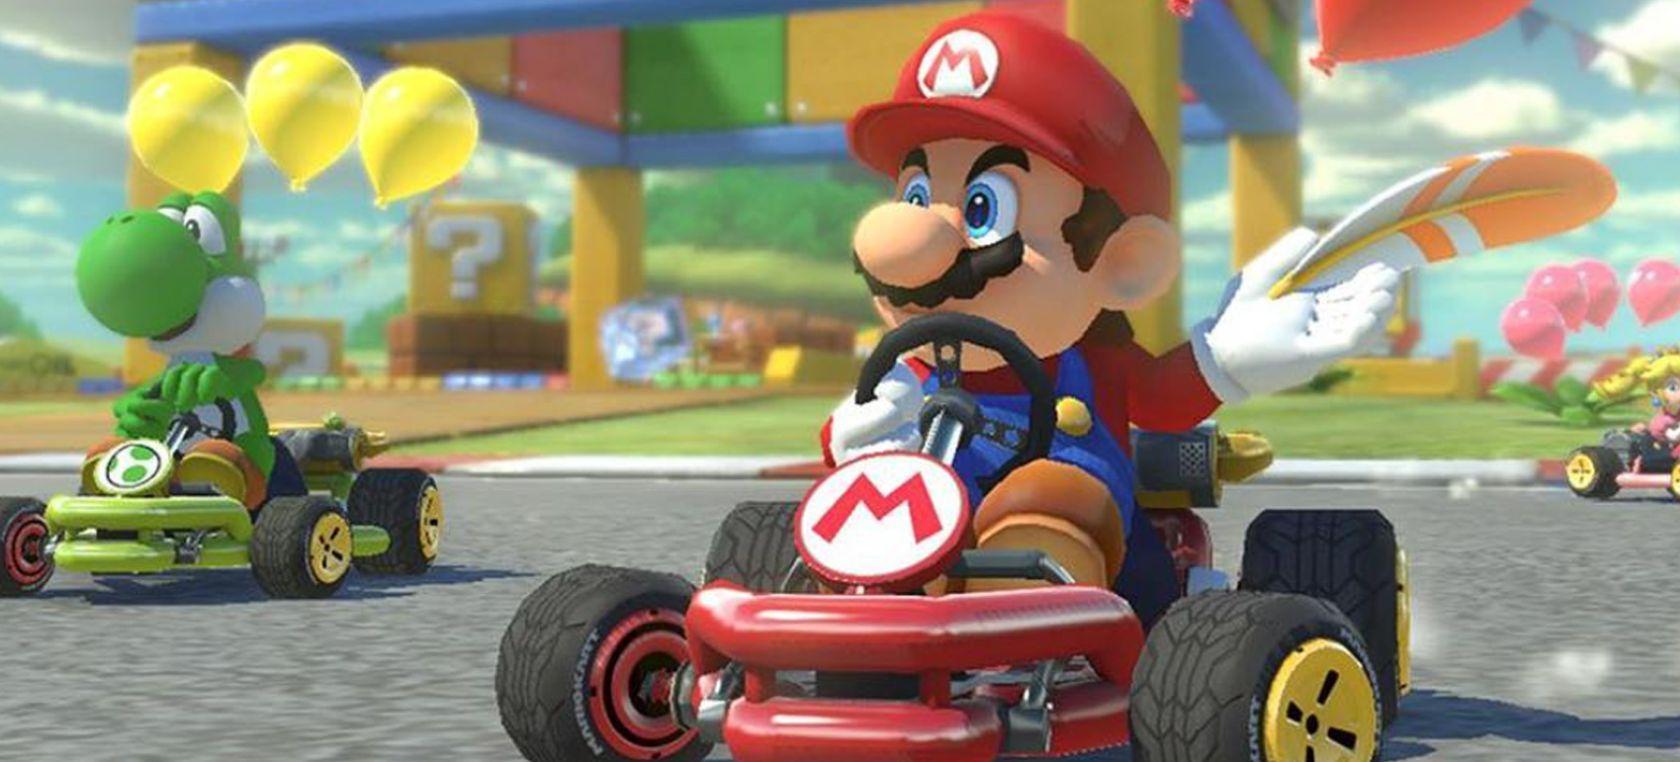 Imagen juego Mario Kart Tour